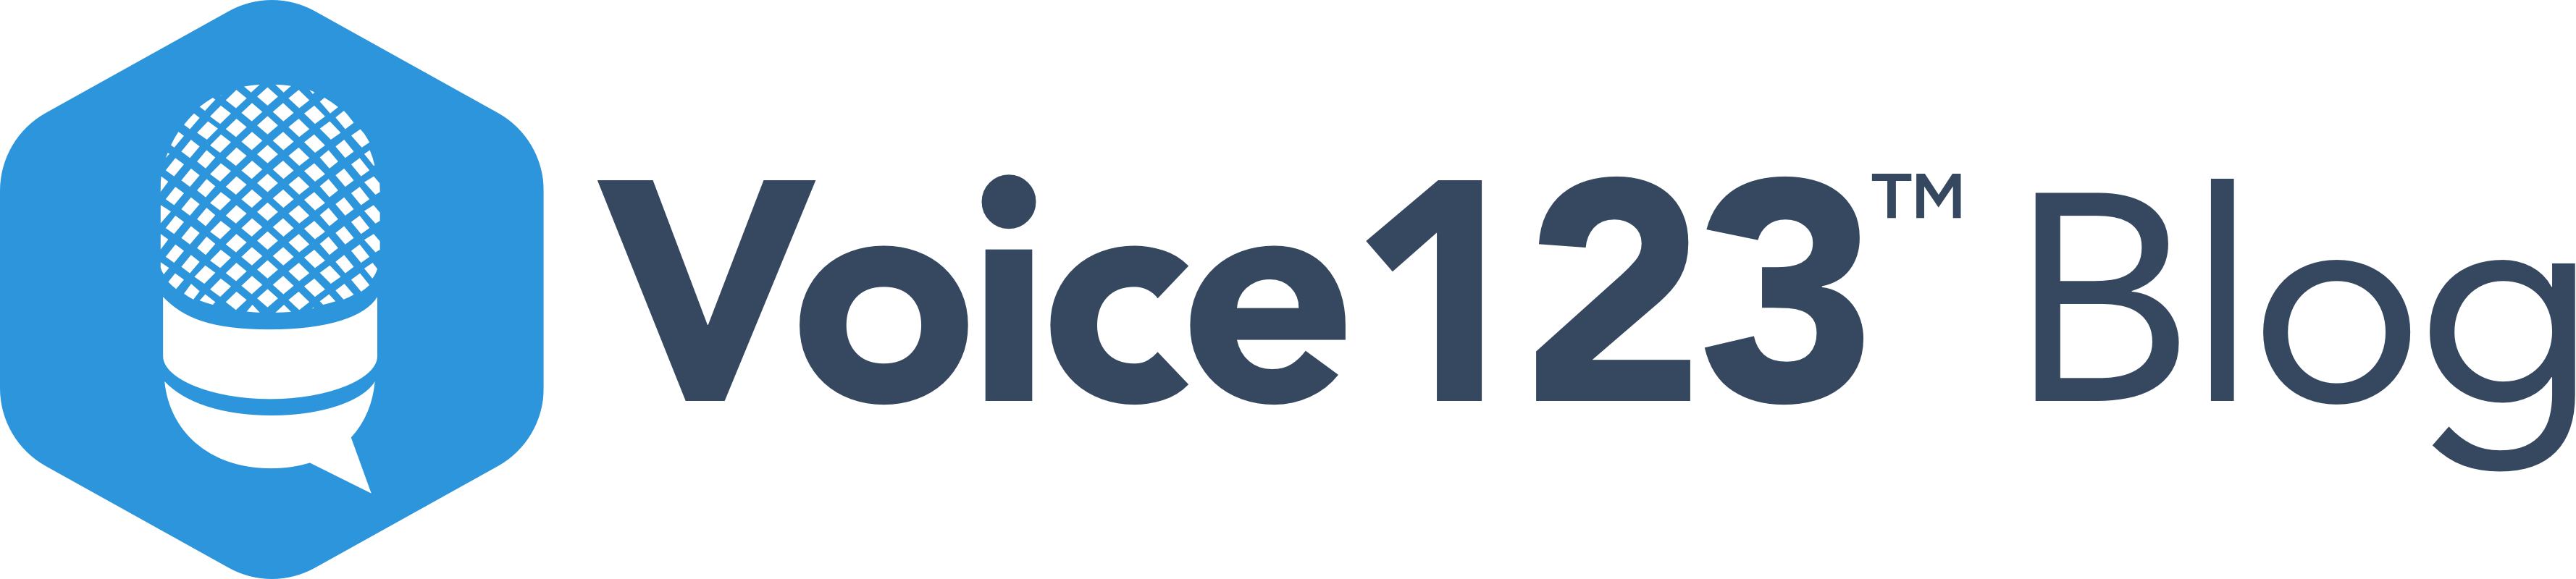 Voice123 blog logo